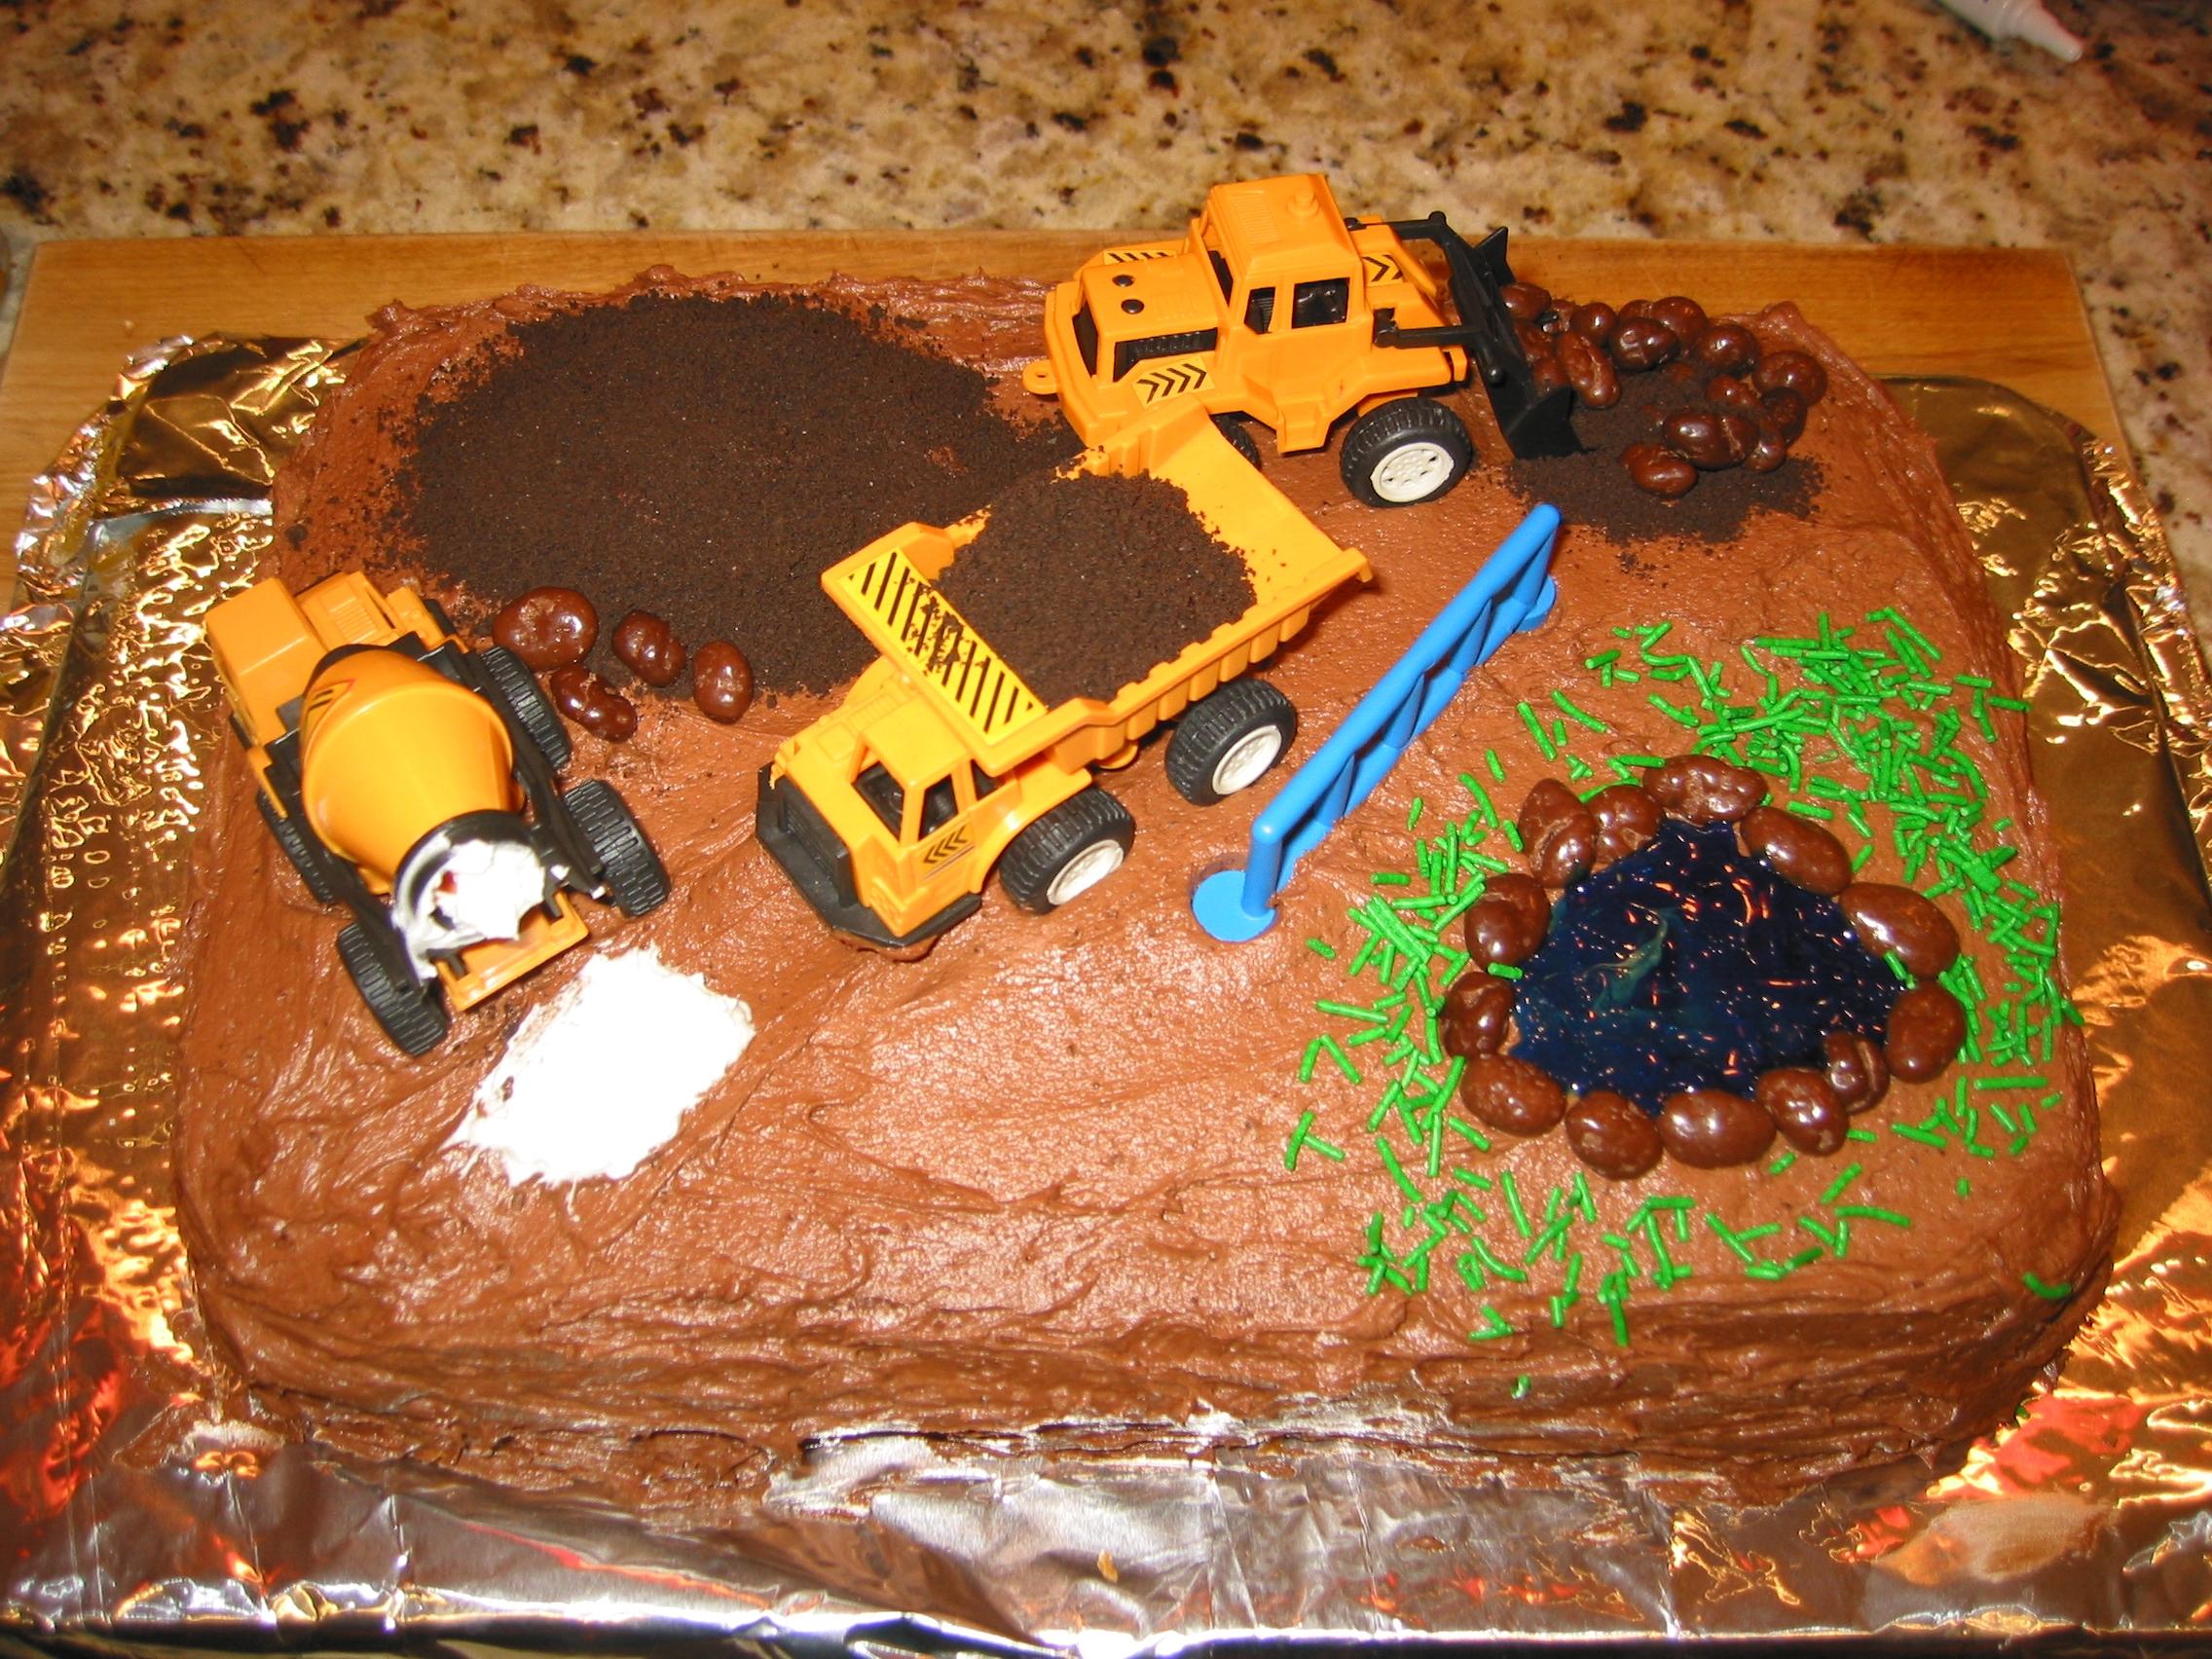 A birthday cake at 4